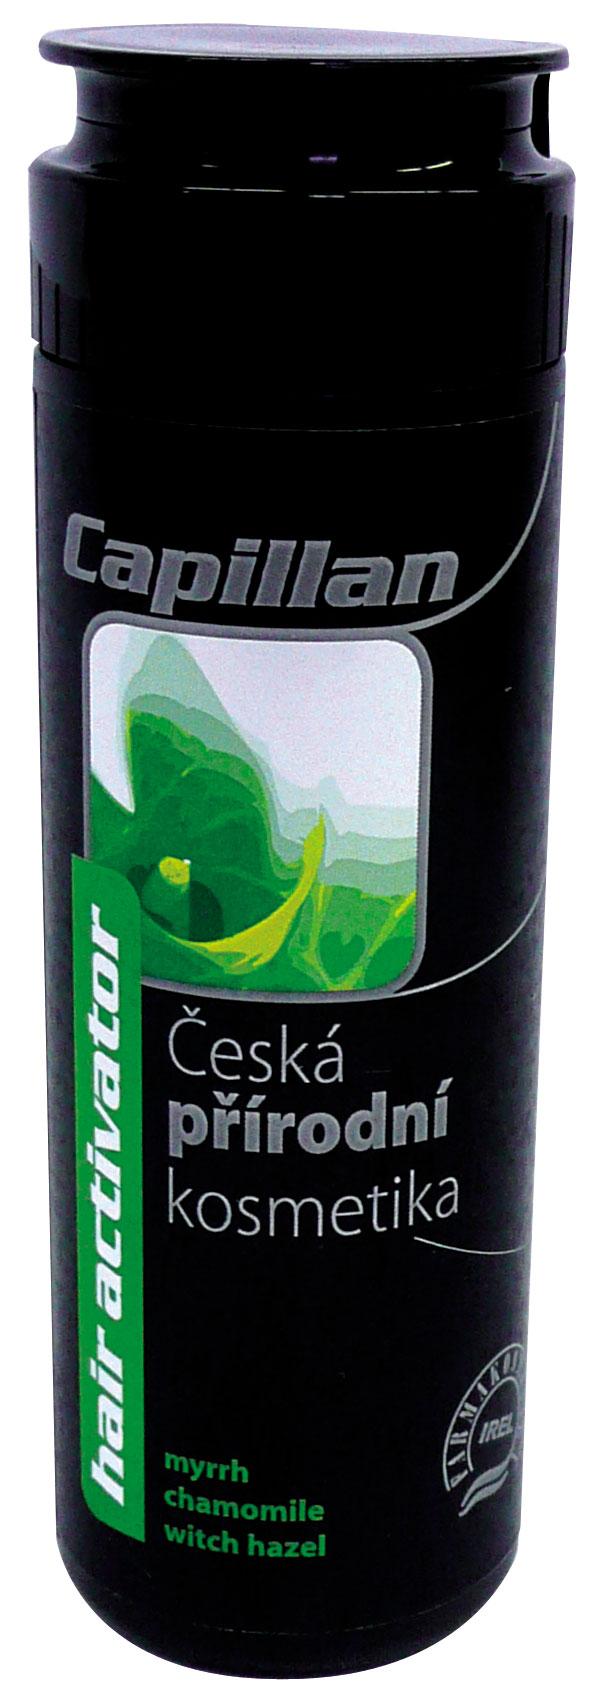 21_capillan-aktivator